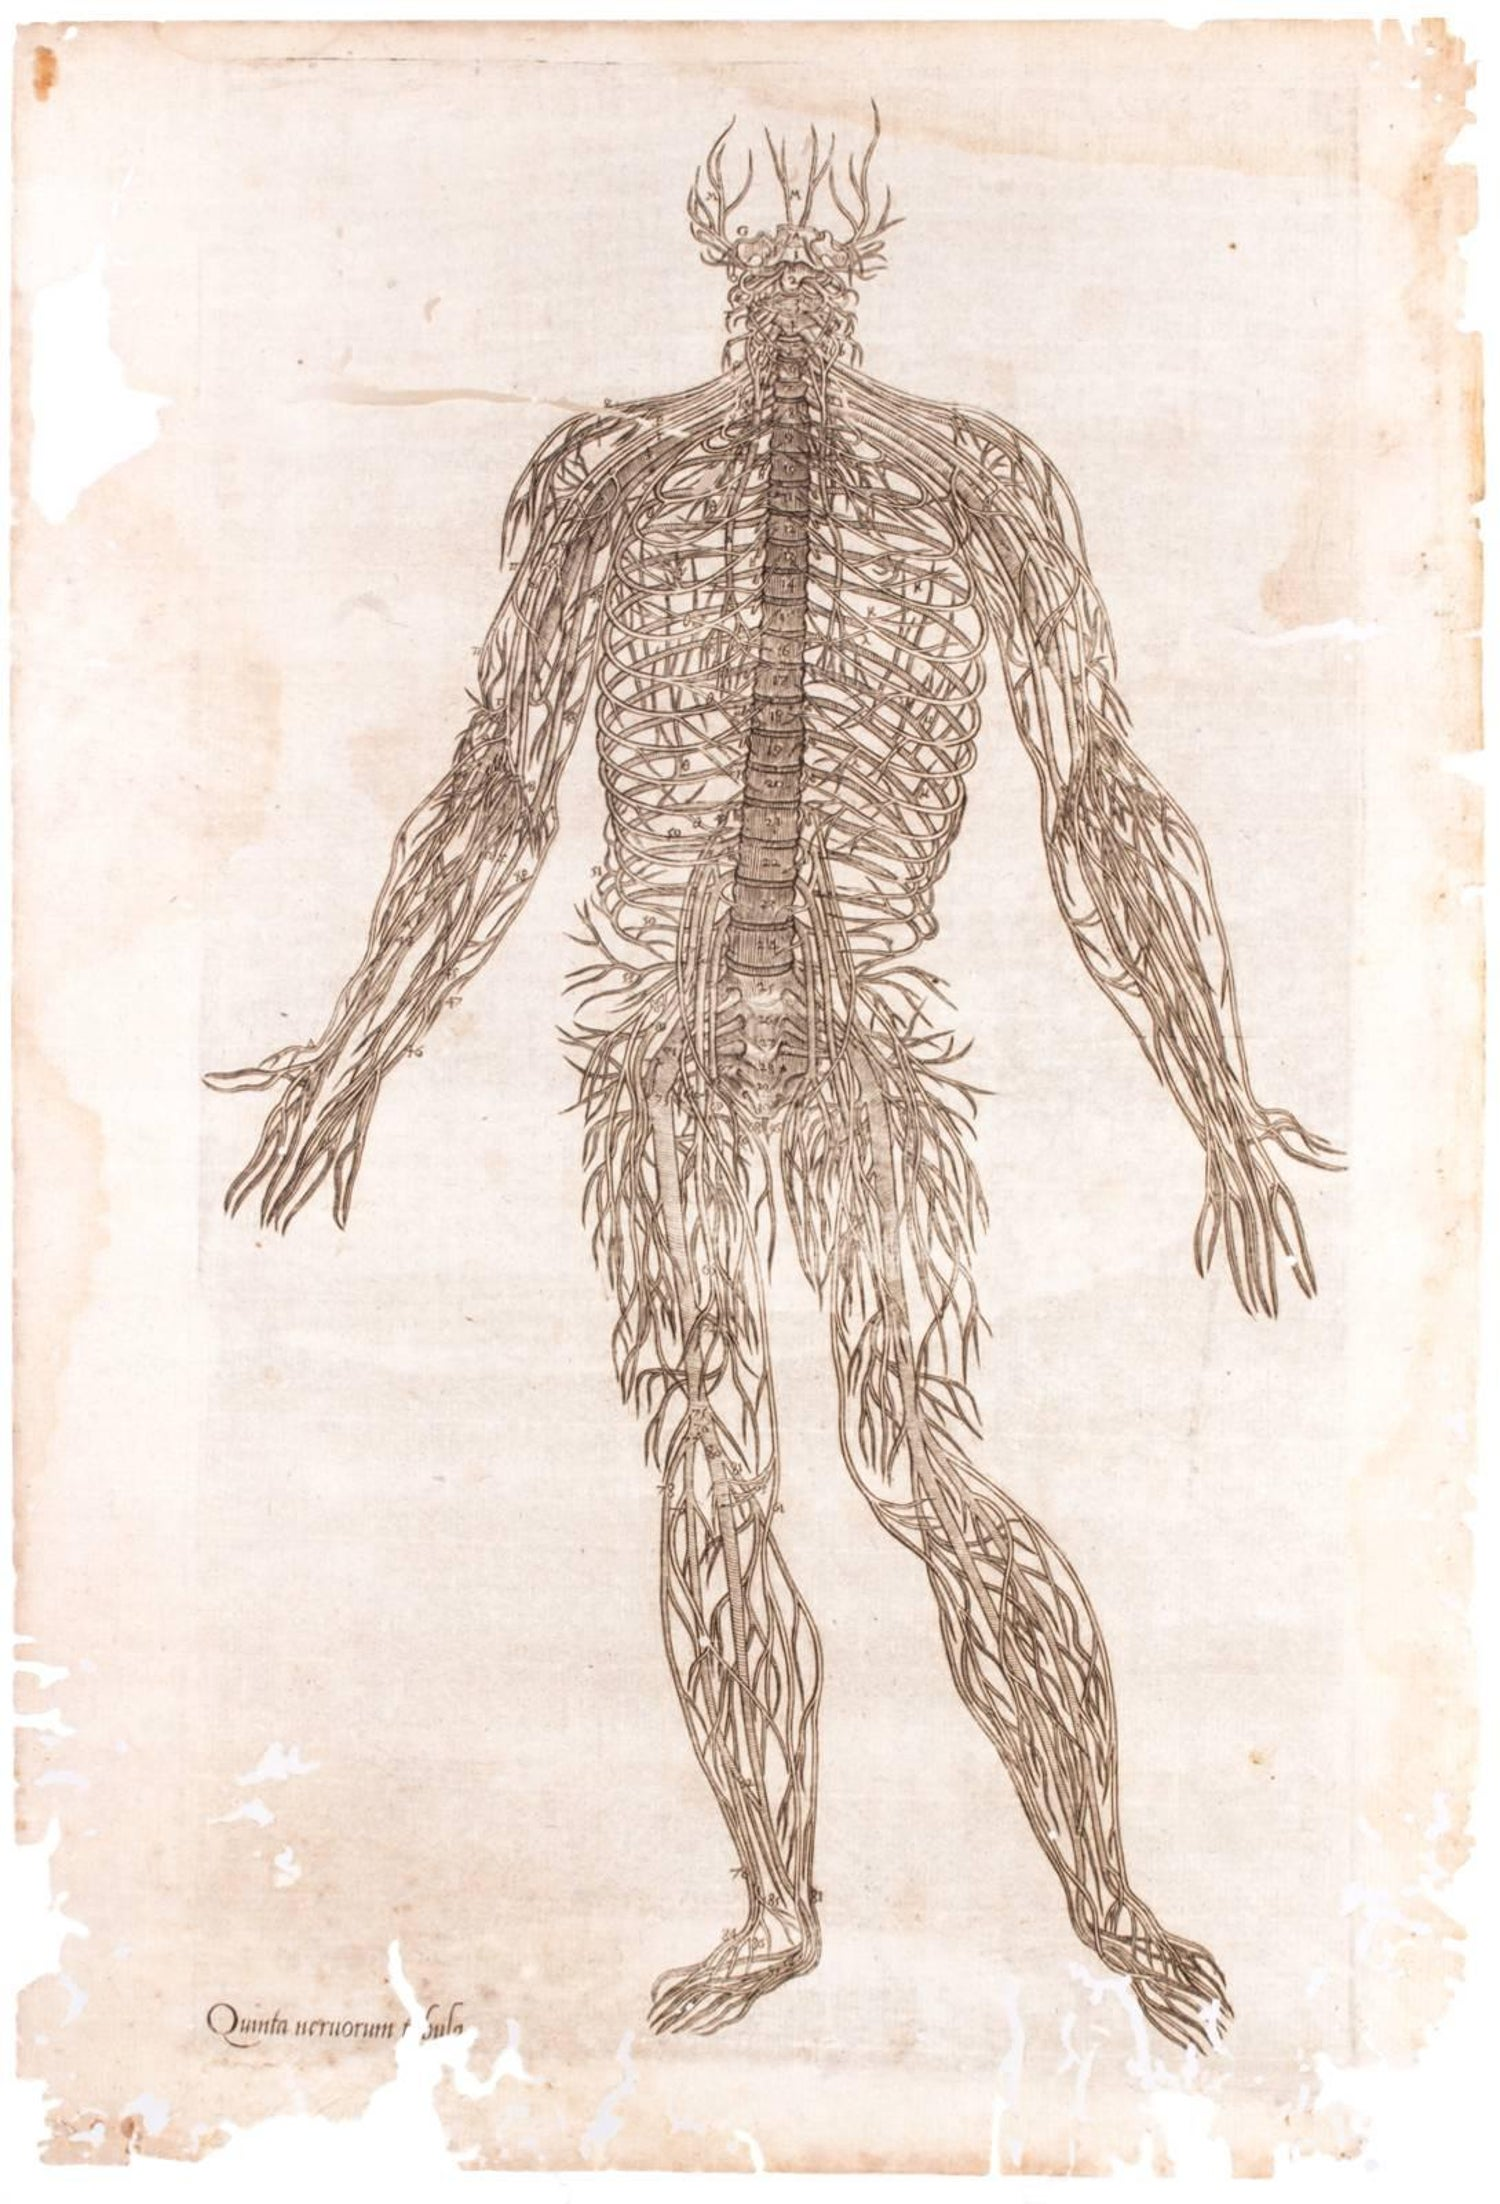 16th Century Andreas Vesalius Anatomical Print On Acrylic At 1stdibs